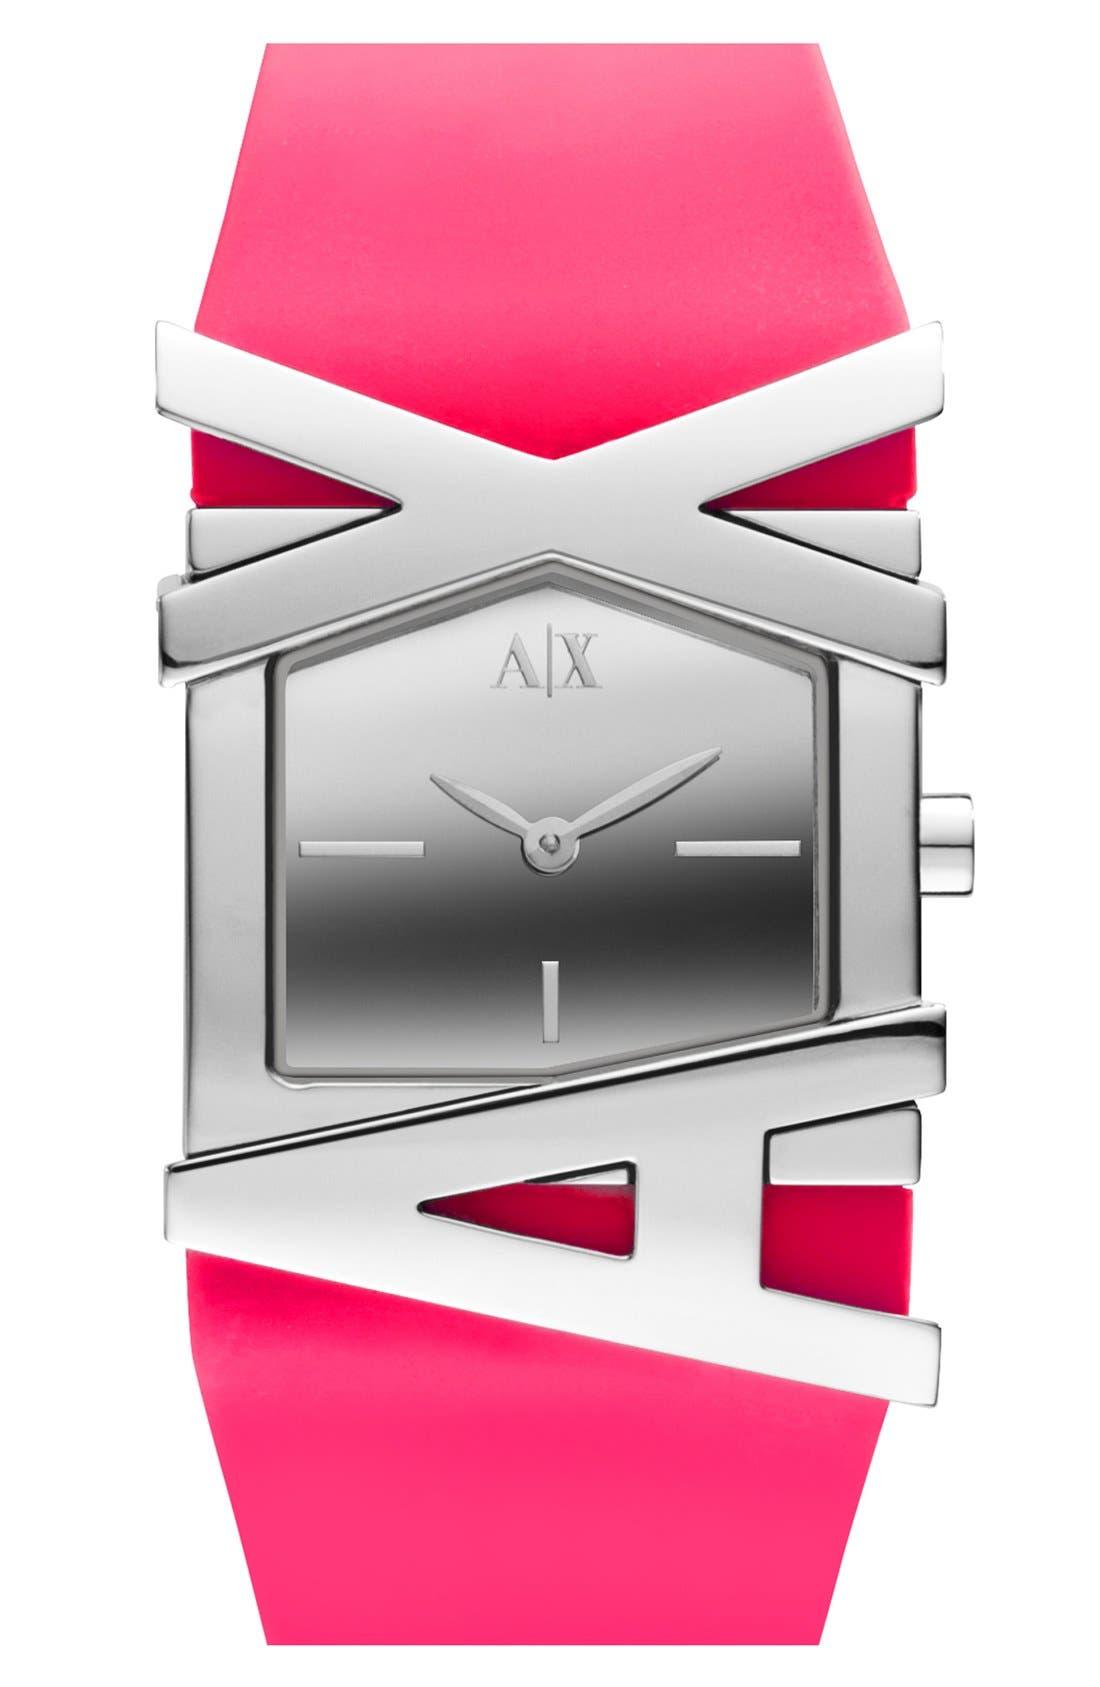 Alternate Image 1 Selected - AX Armani Exchange Logo Watch, 39mm x 28mm